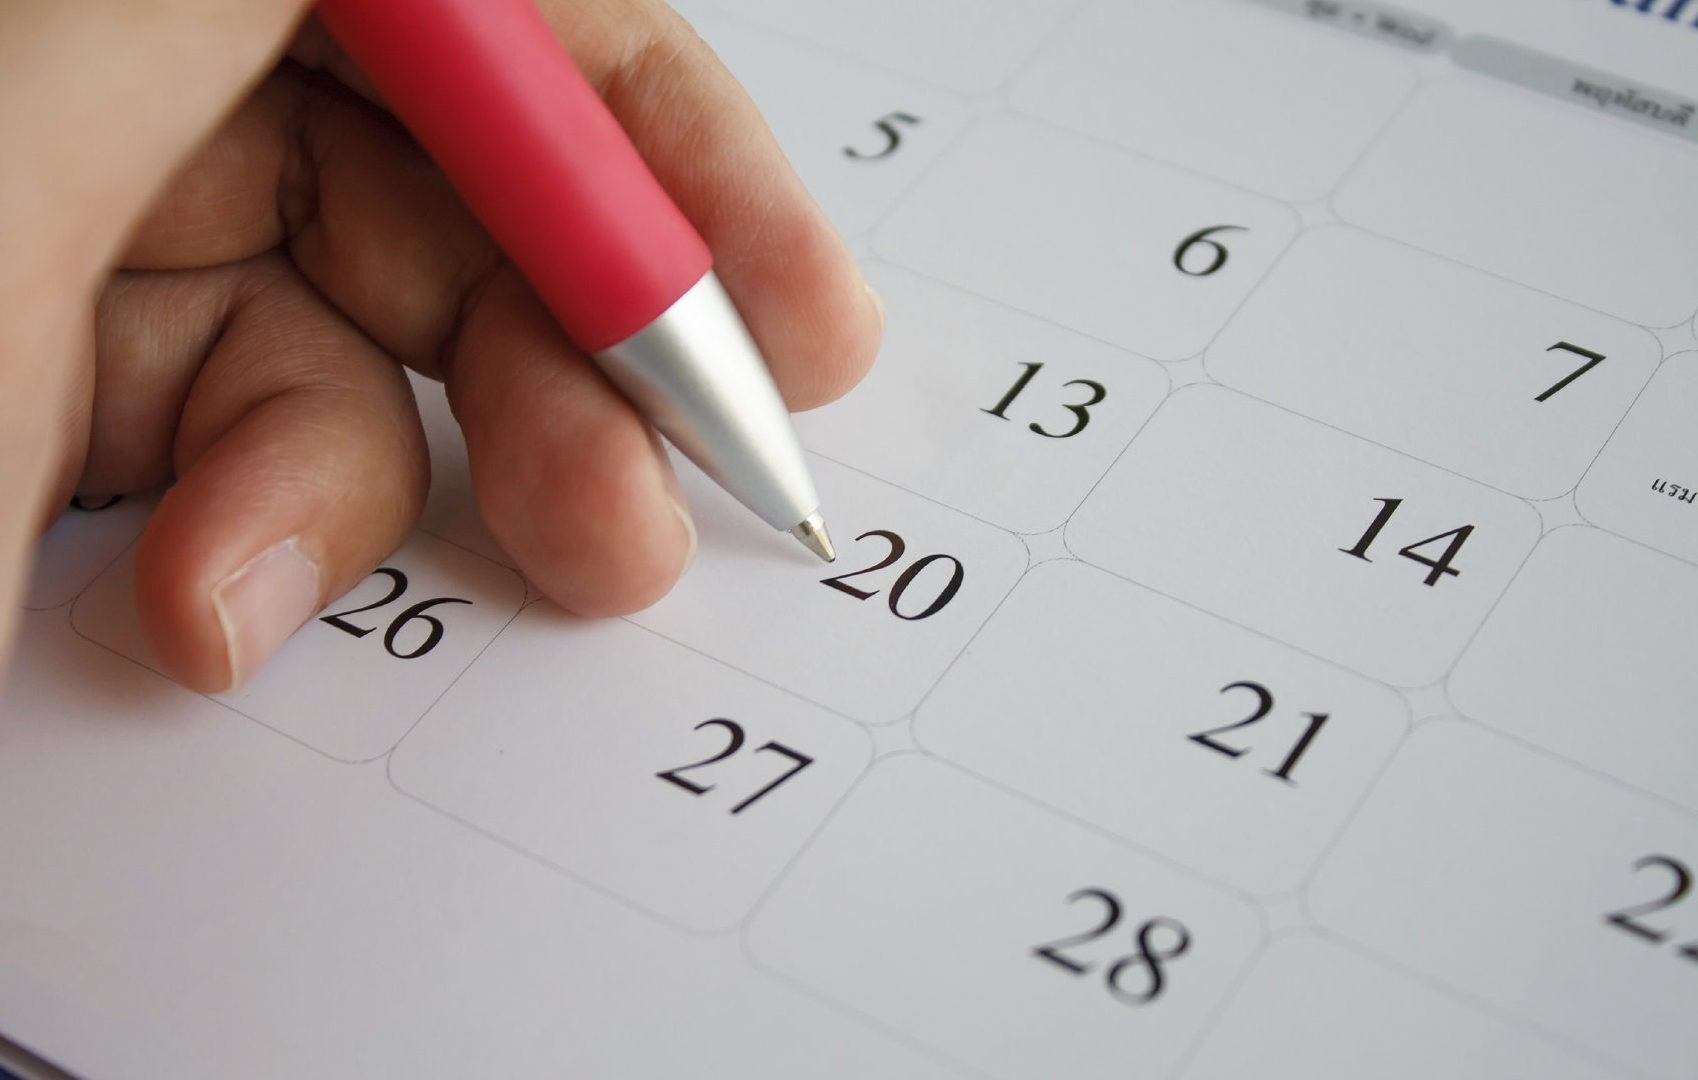 Jewish Holiday Calendar: Major Dates For 2019! | Jdate-Dates For The Jewish Holidays In October